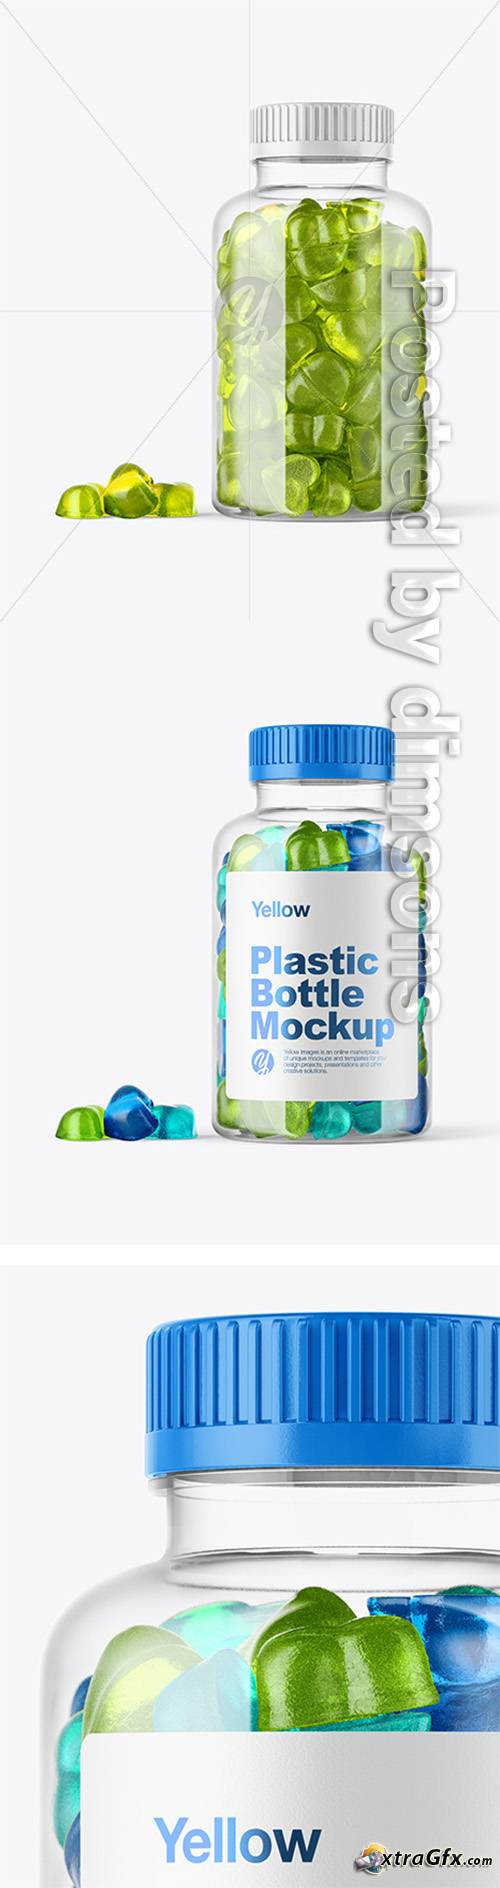 Plastic Bottle with Gummies Mockup 38698 TIF xtraGFX Creating 500x1888